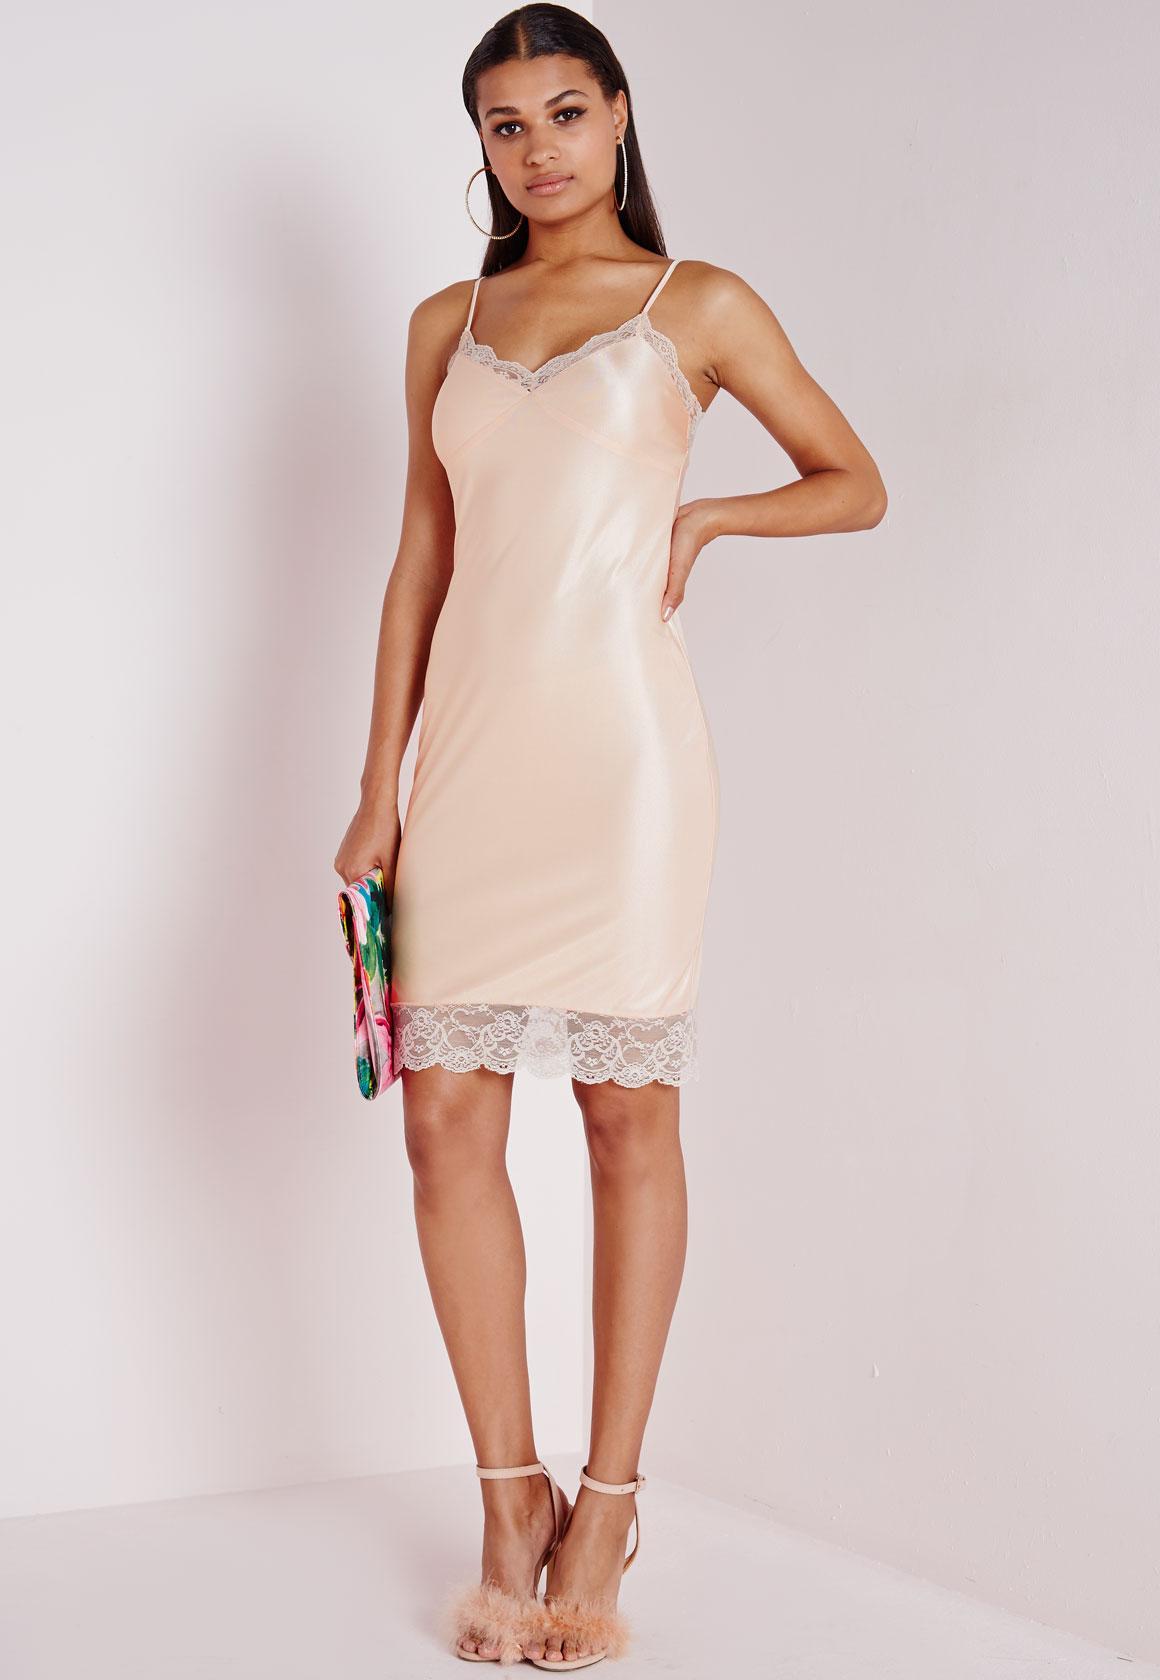 Charmeuse Weding Dreses 06 - Charmeuse Weding Dreses